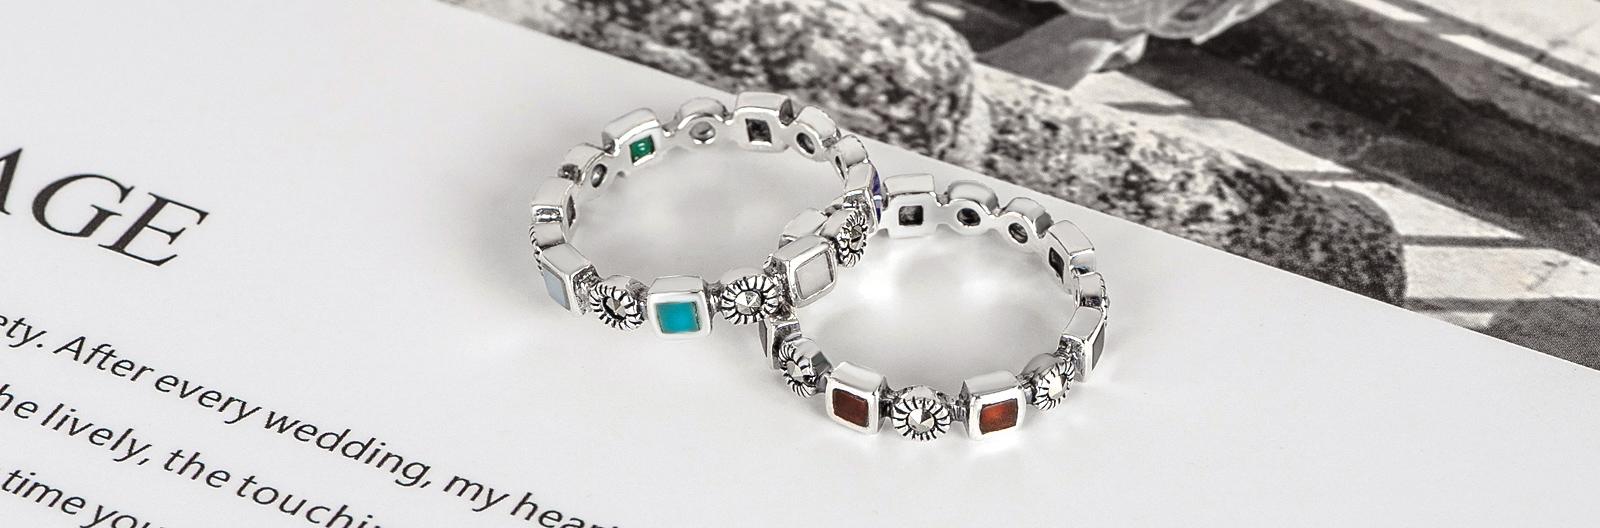 Slide Wholesale Jewelry 490